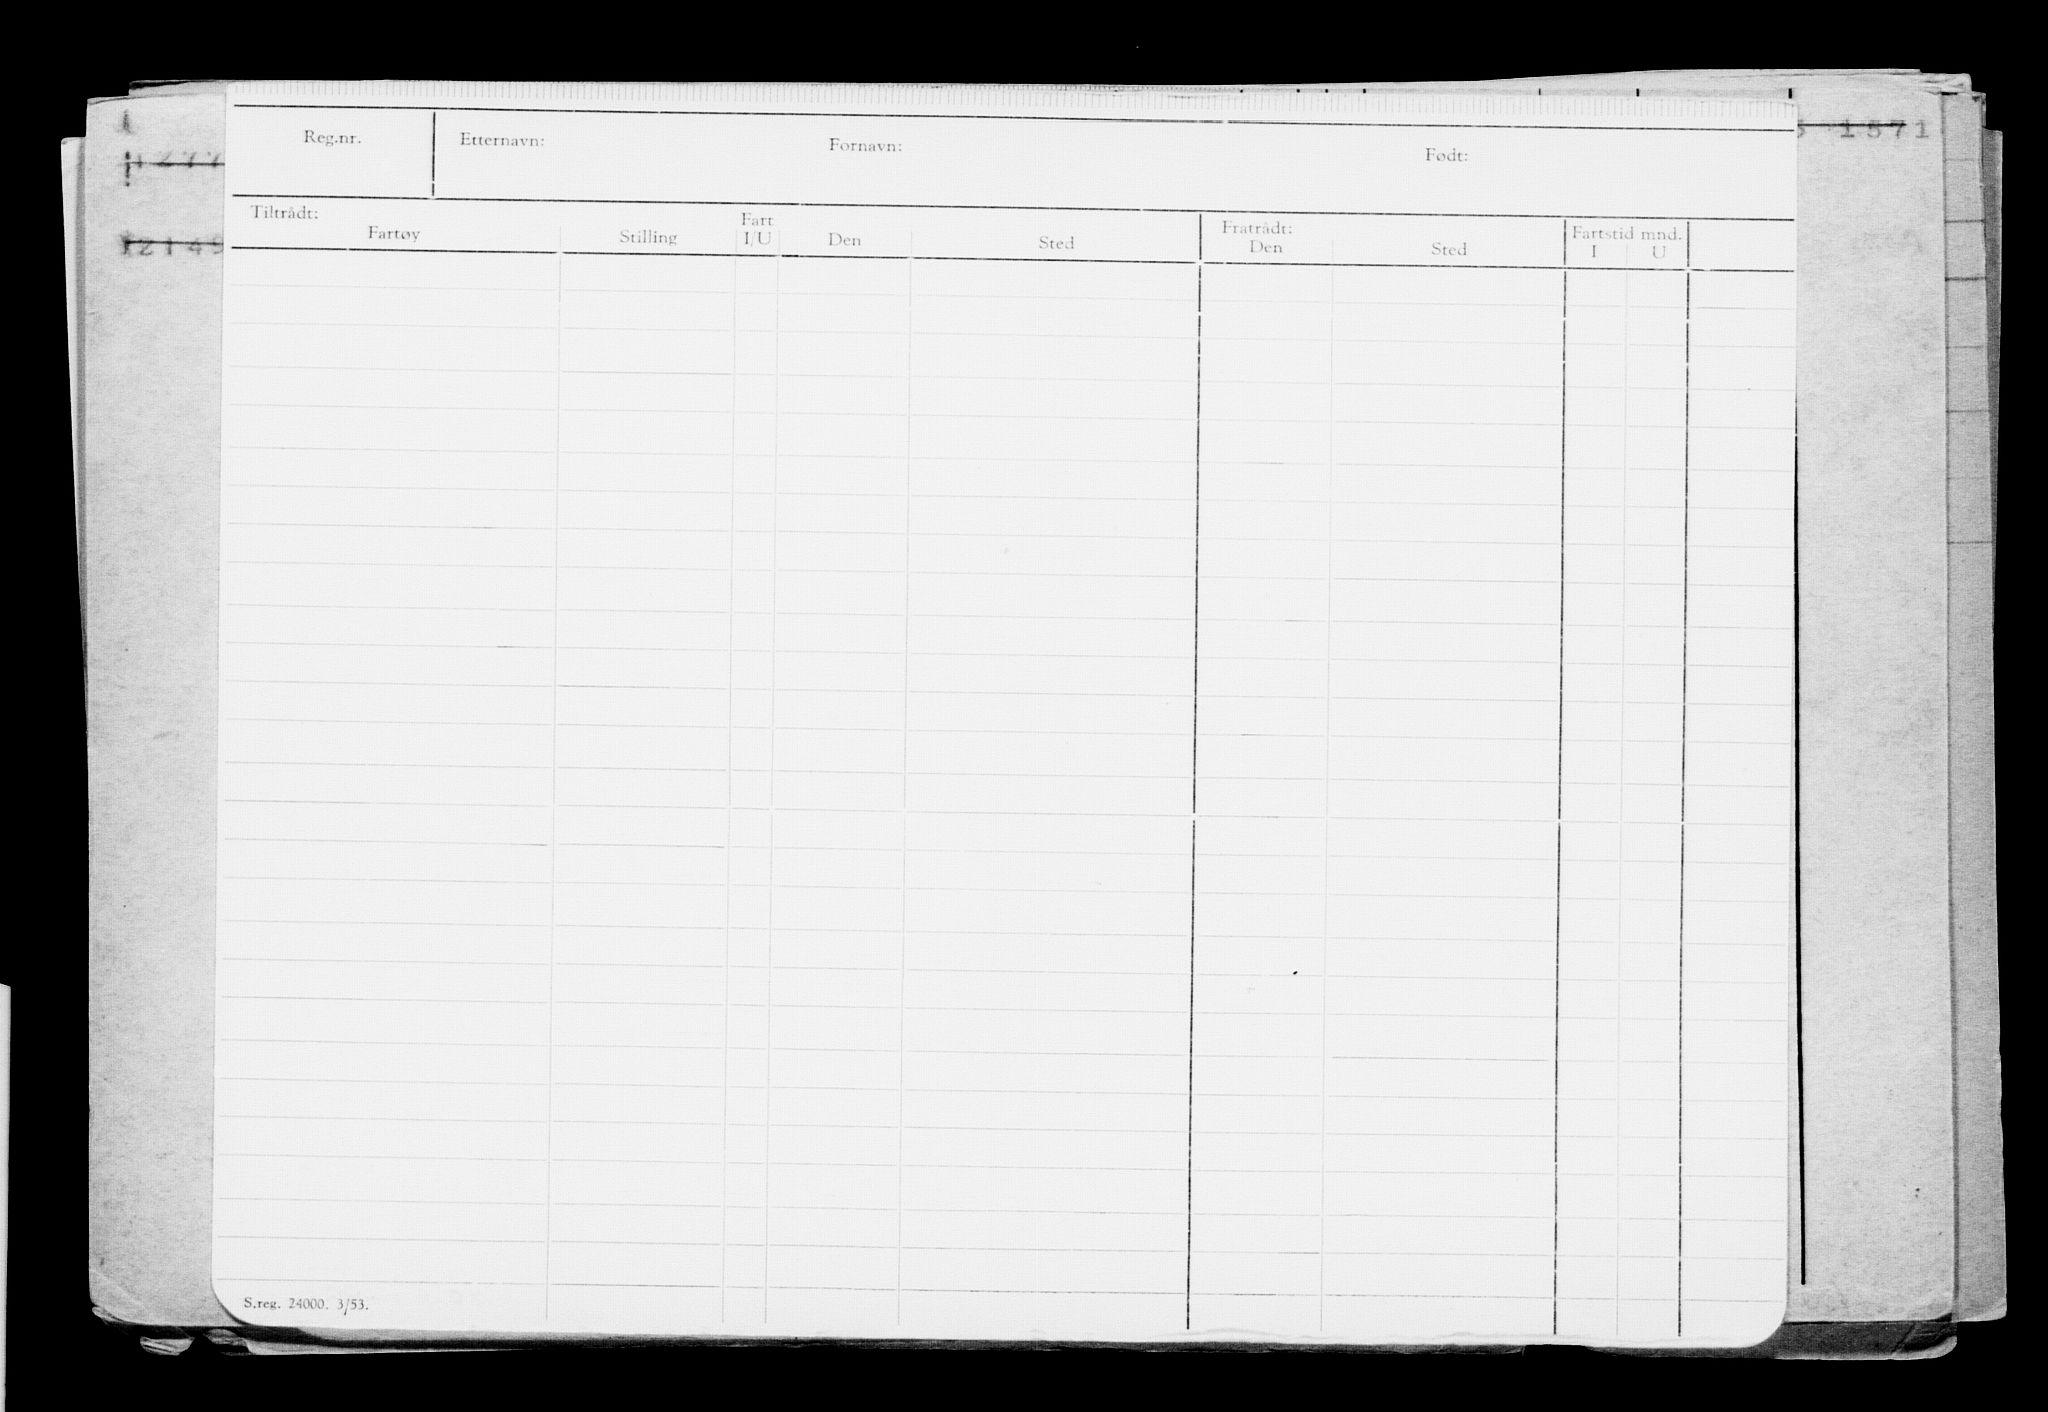 RA, Direktoratet for sjømenn, G/Gb/L0005: Hovedkort, 1888, s. 372